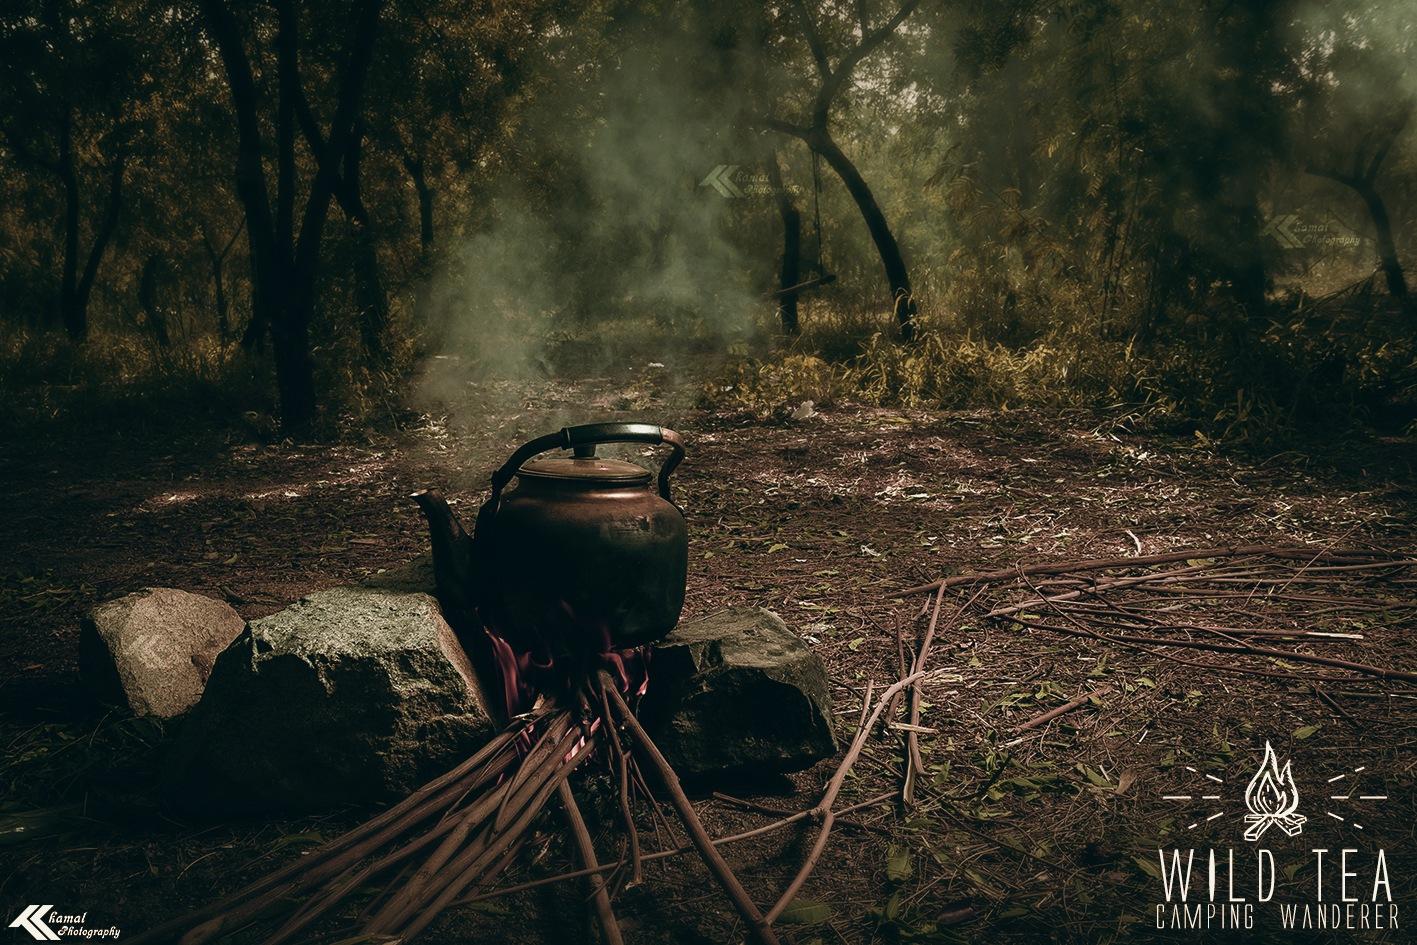 Wild Tea by Kamal MP